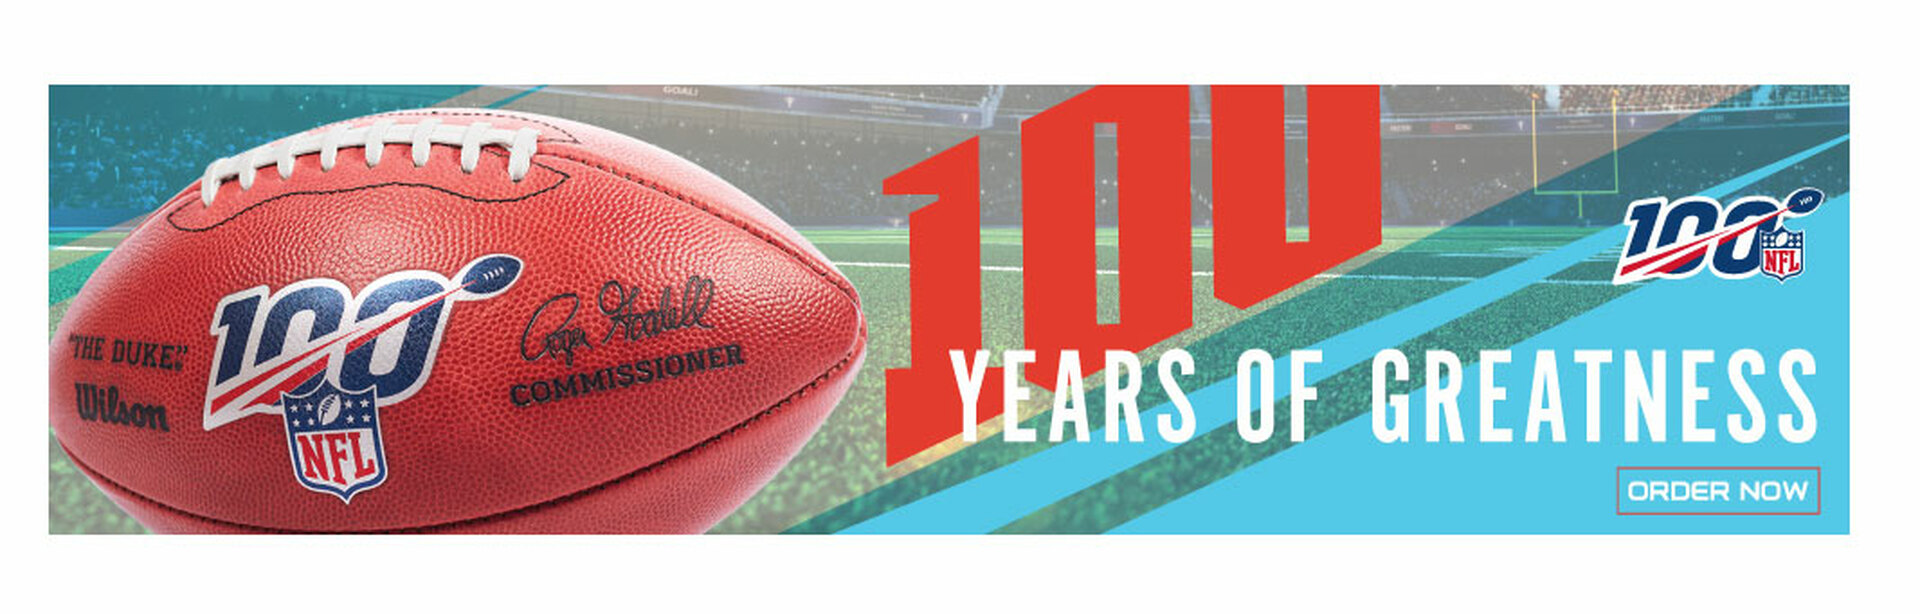 NFL 100 Anniversary Pins